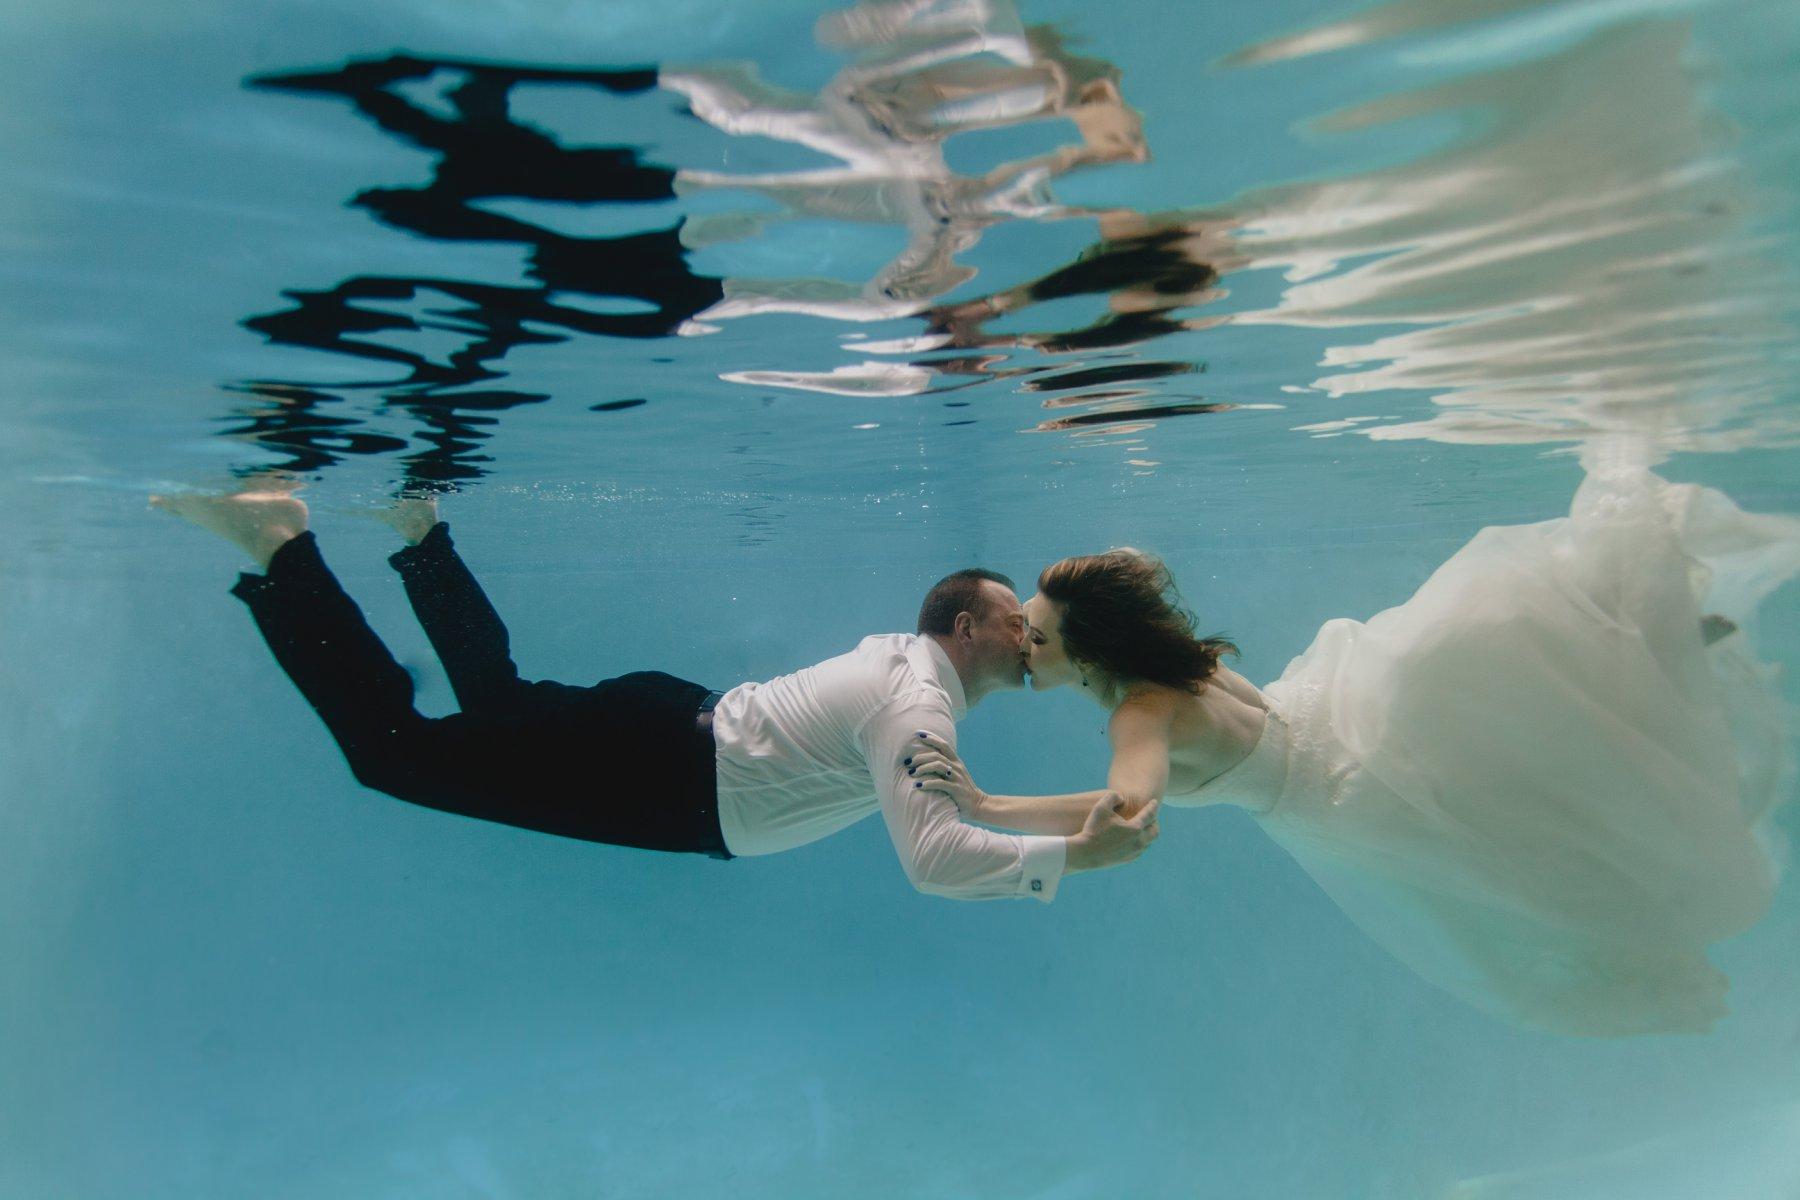 underwater wedding photos in a pool